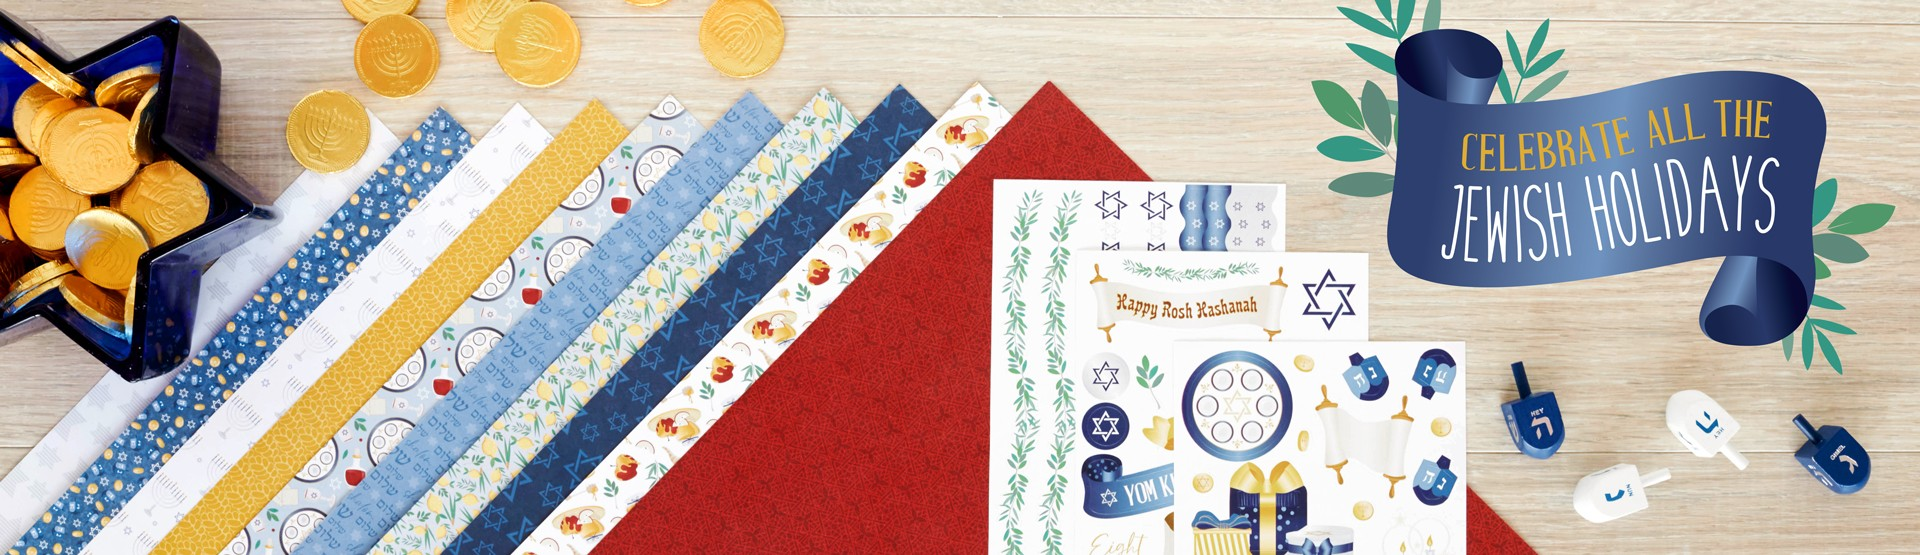 Religious Scrapbooking Supplies: Jewish Holidays